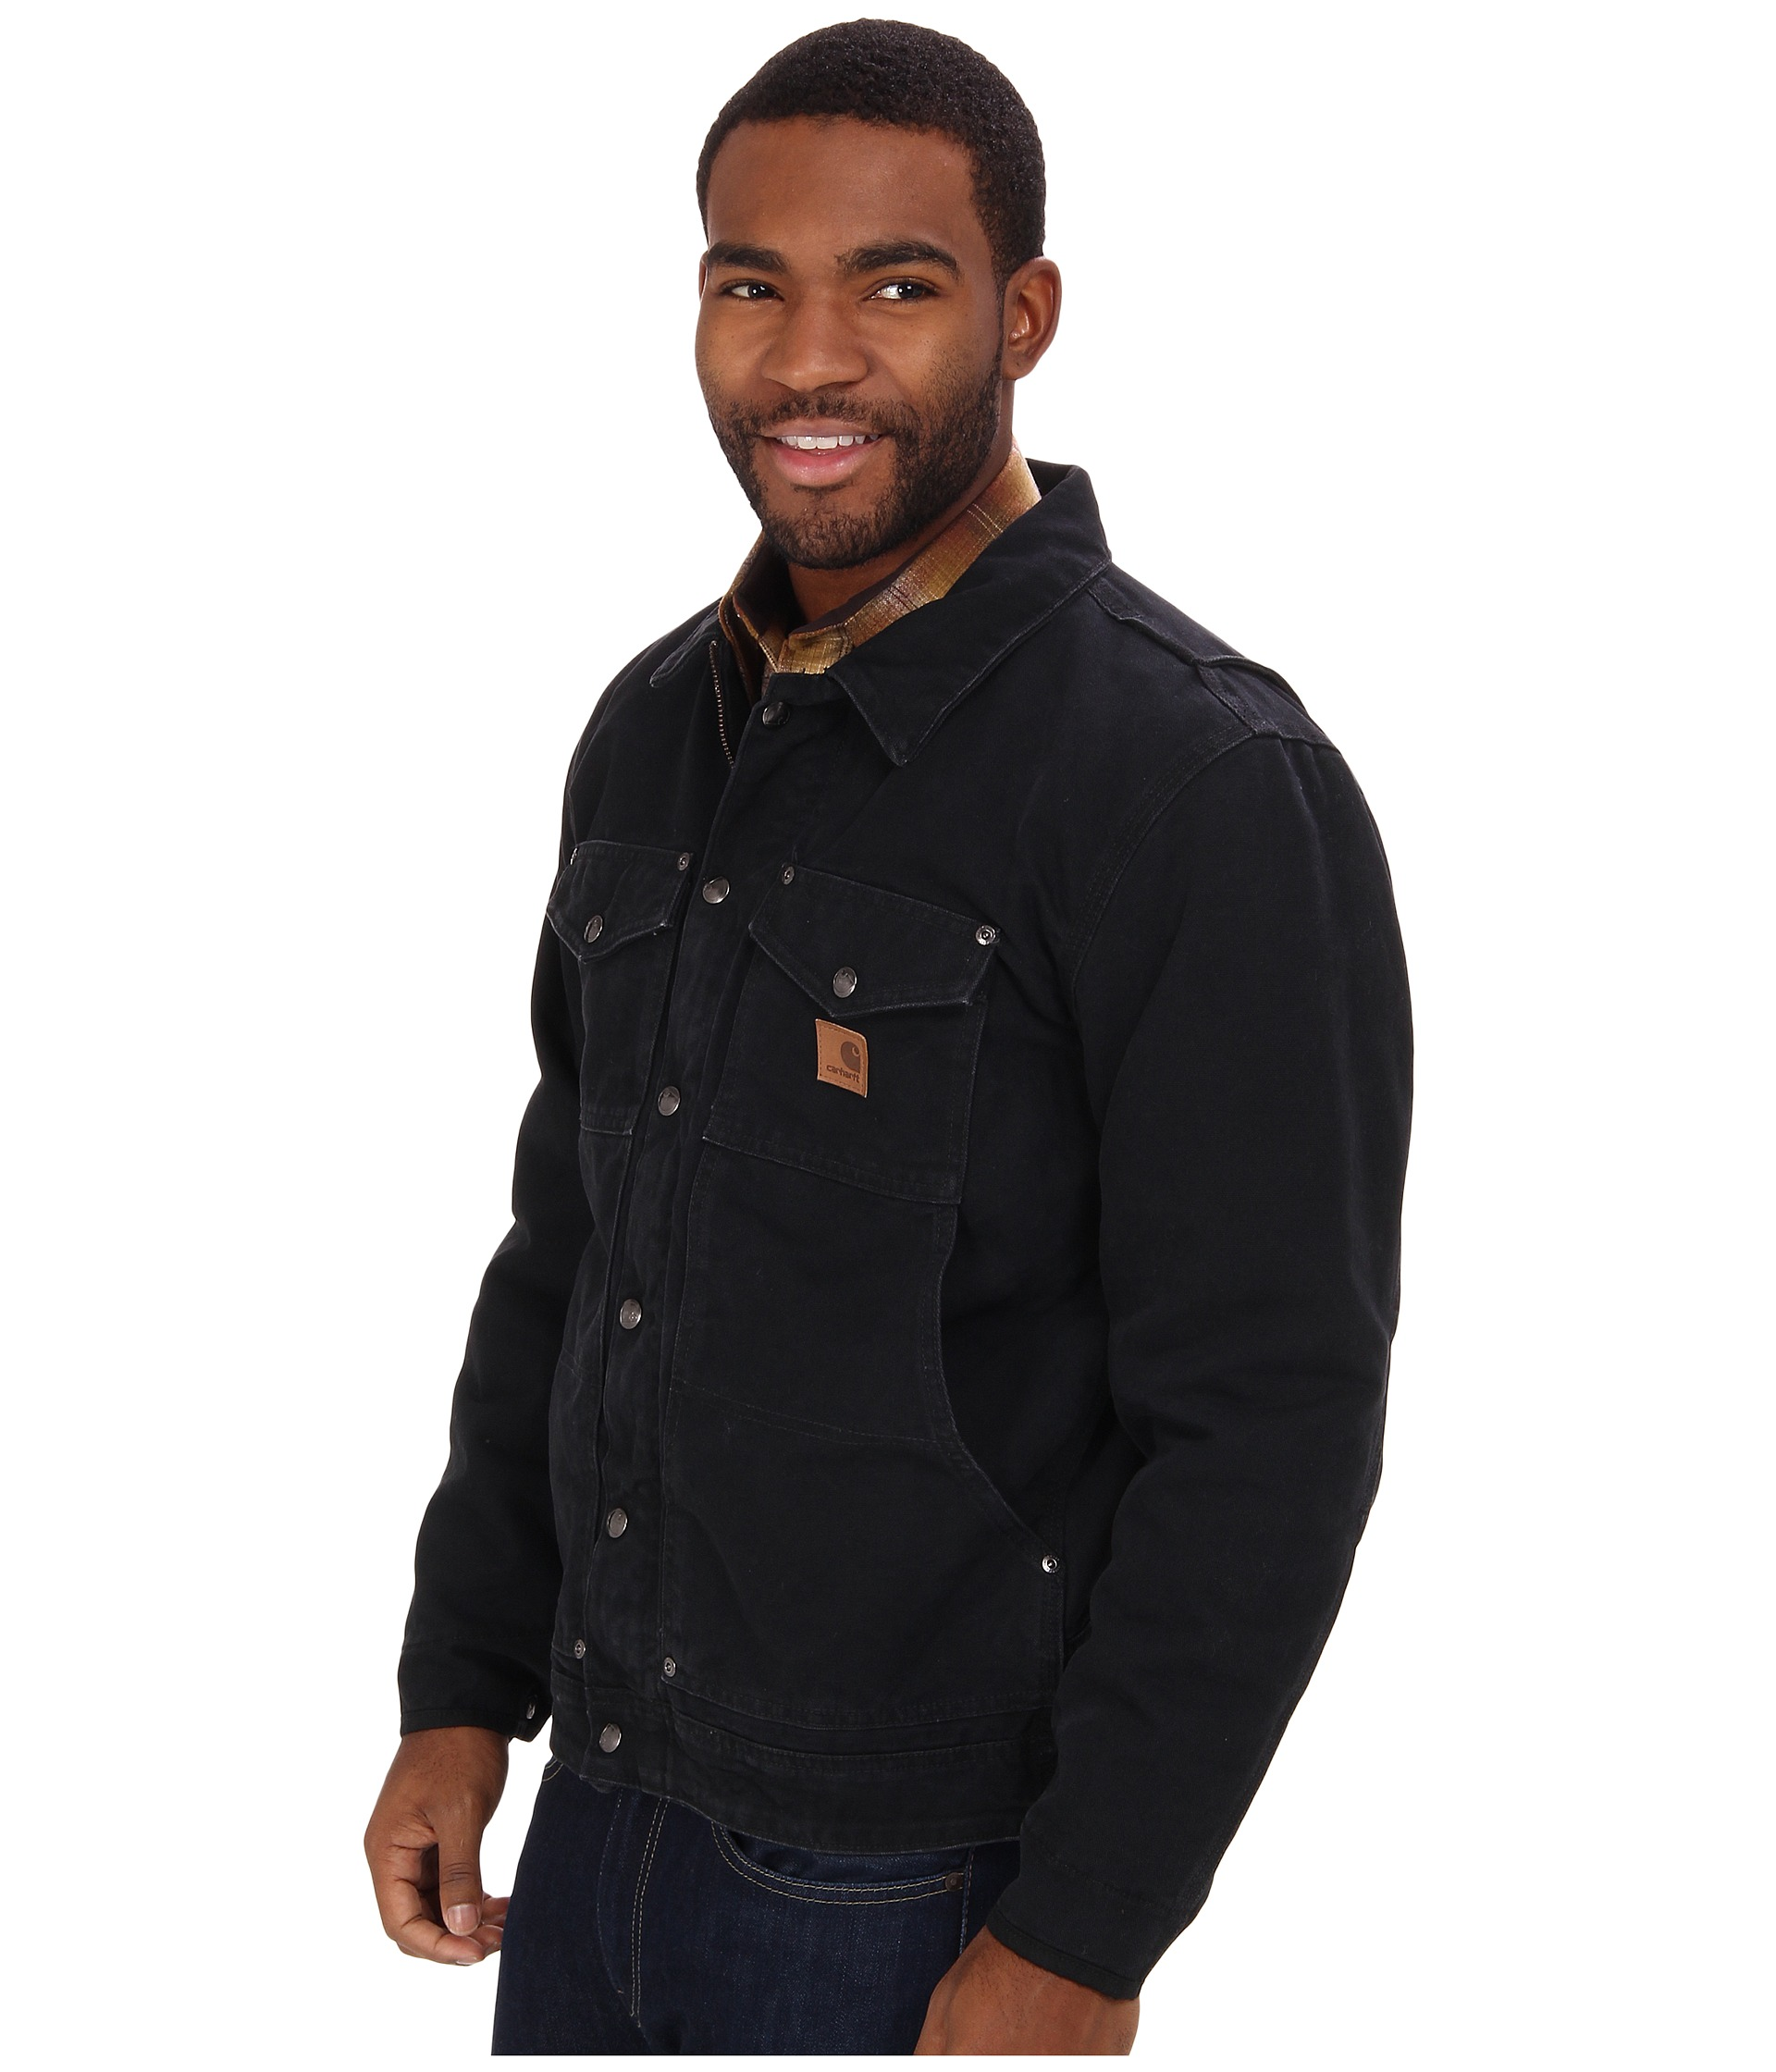 woodsville guys Carhartt 101740 - woodsville jacket  home carhartt men's jackets & coats  carhartt 101740 - woodsville jacket - fleece lined.